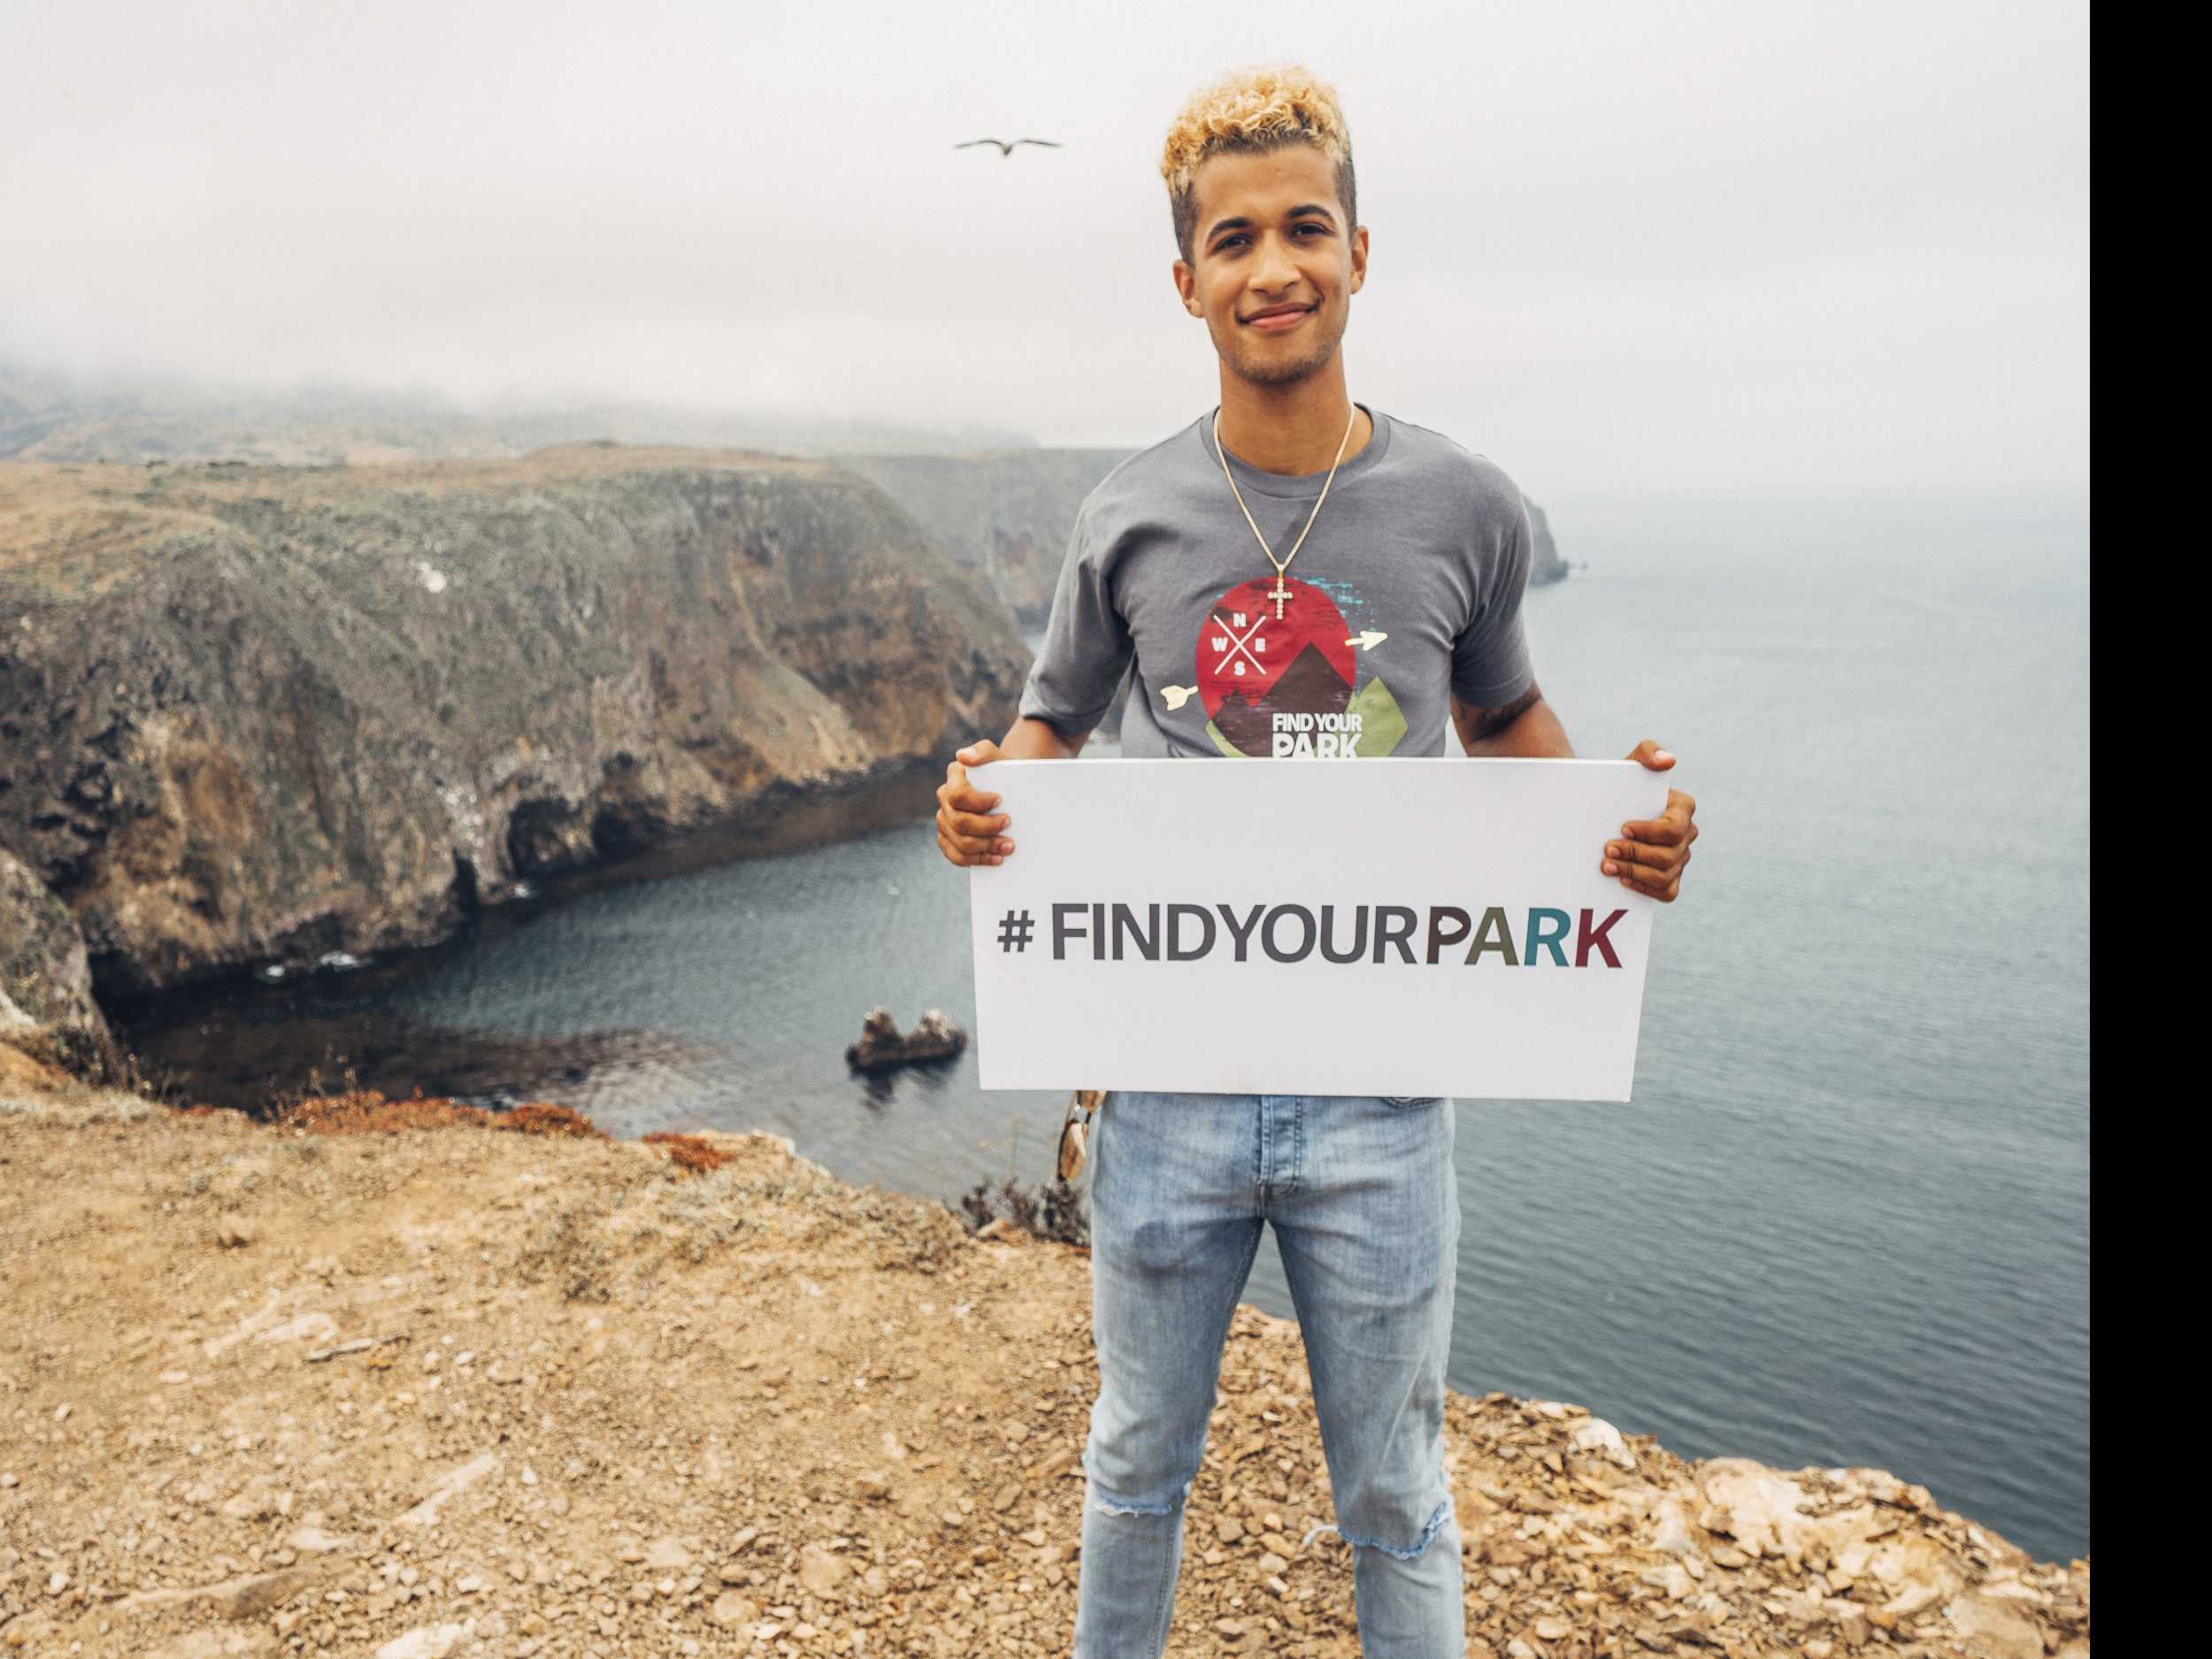 Celeb Ambassadors Help National Parks Mark 101st Birthday